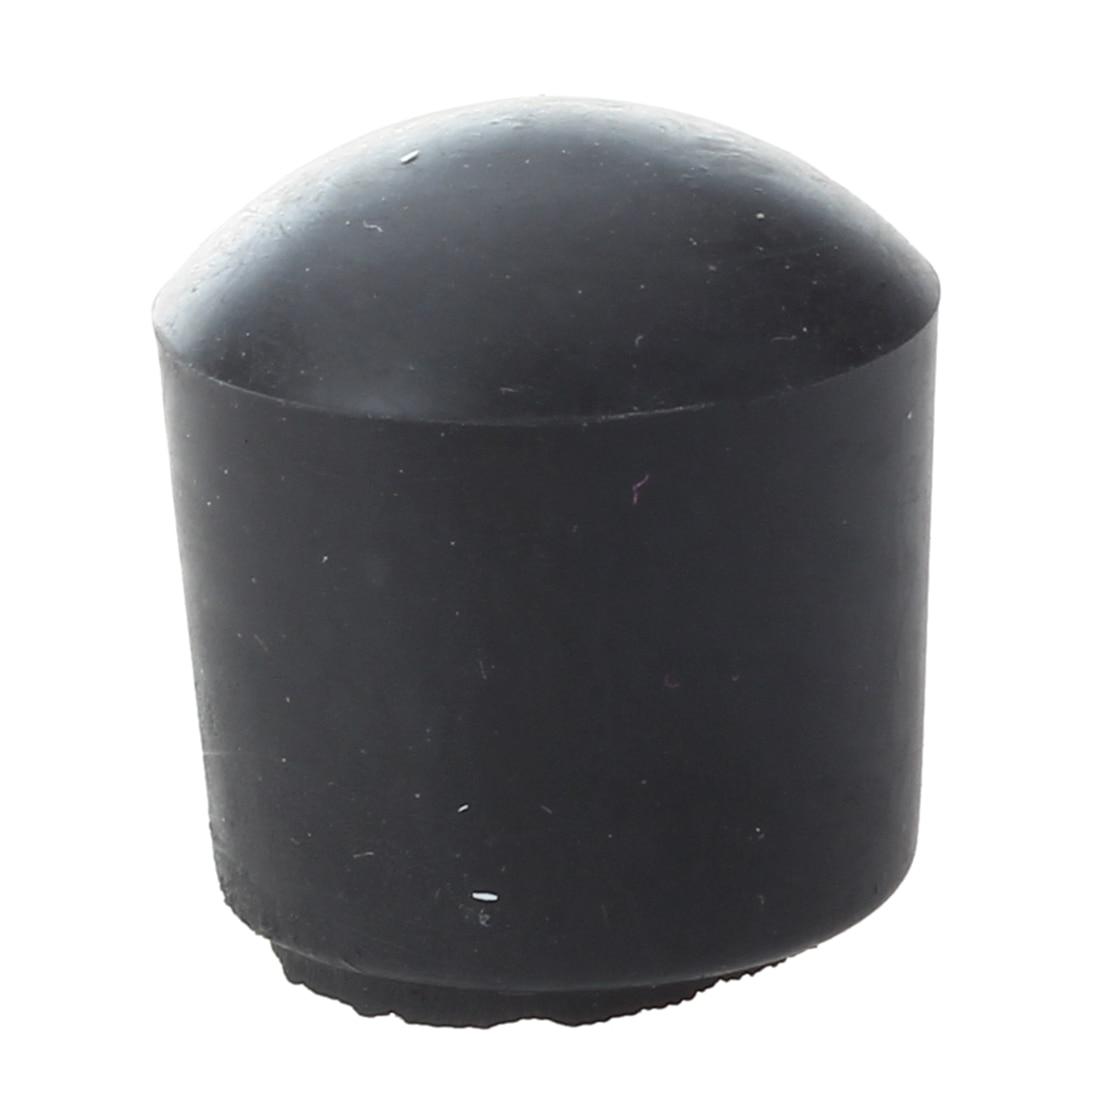 8Pcs 5/8 Inch Foosball Soccer Football Table Rod Lid End Cap Fussball Black